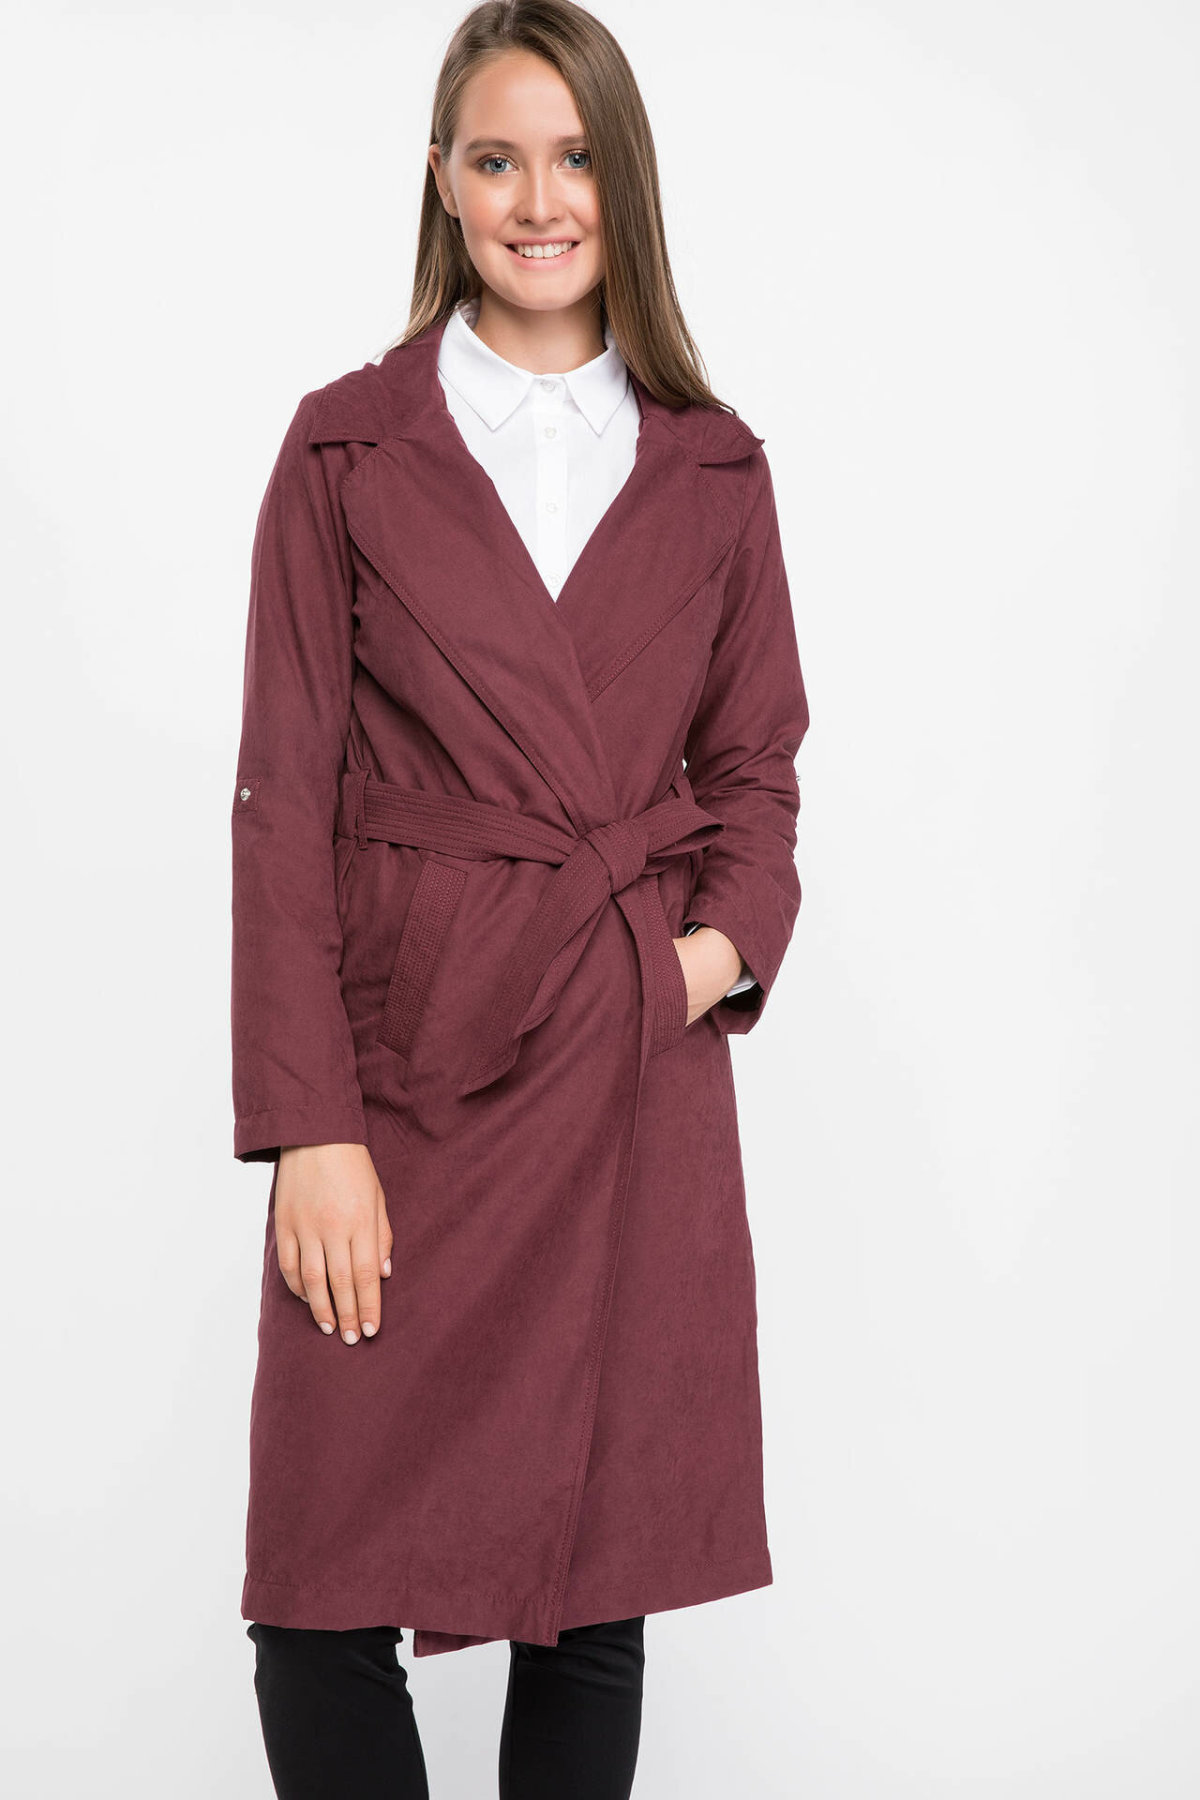 DeFacto New Woman Fashion Lapel Collar Long Coat Belt Long Sleeves Pocket Simple Long Jacket Autumn  - I6012AZ18AU